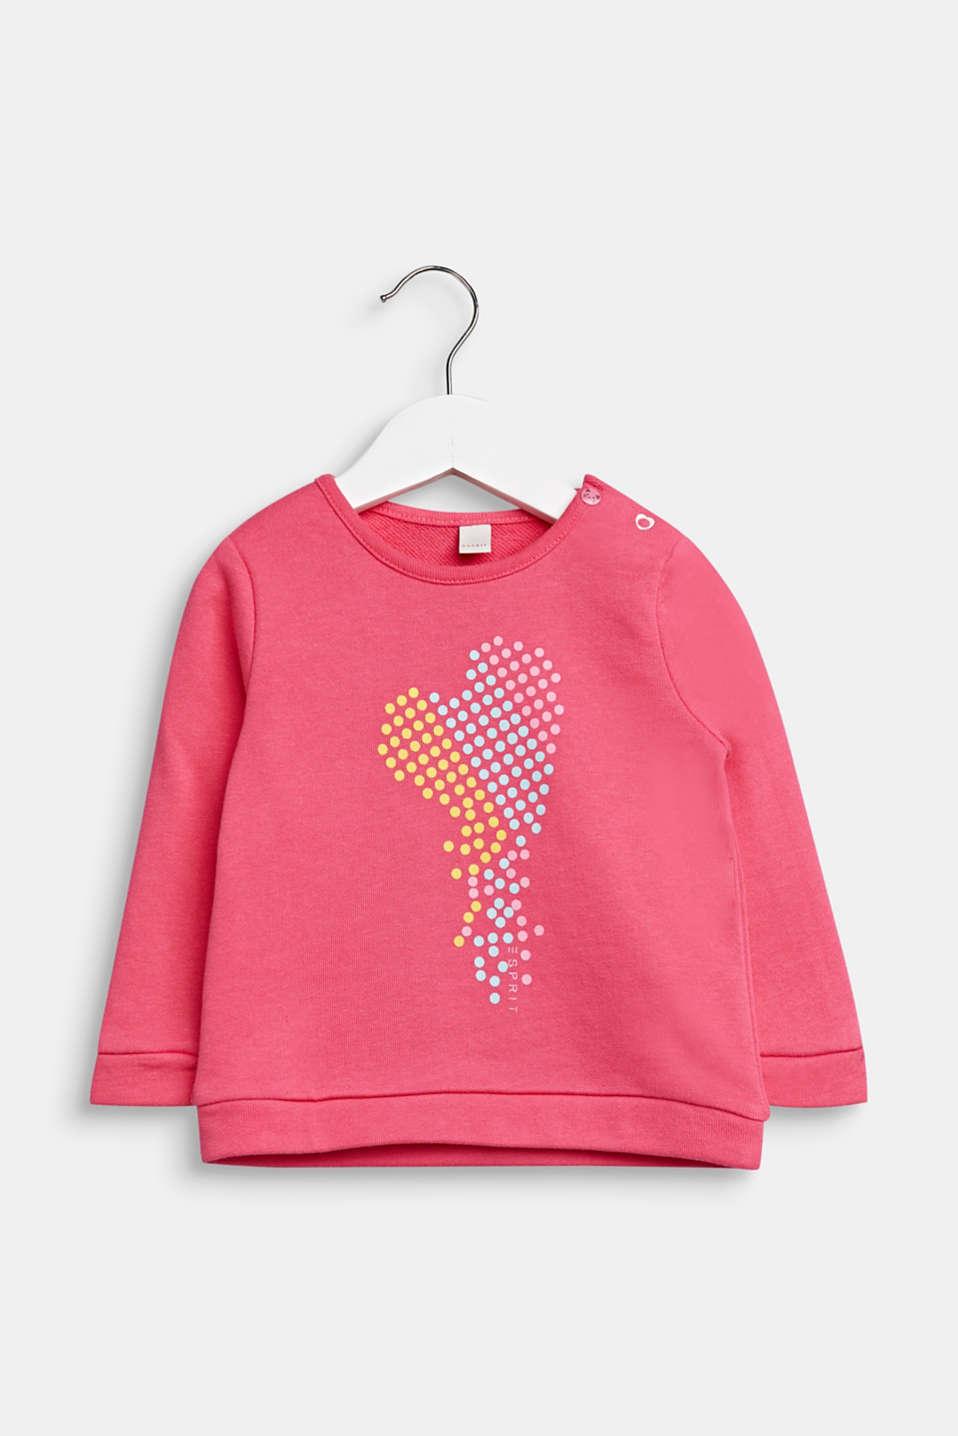 Heart print sweatshirt, 100% cotton, LCCANDY PINK, detail image number 0